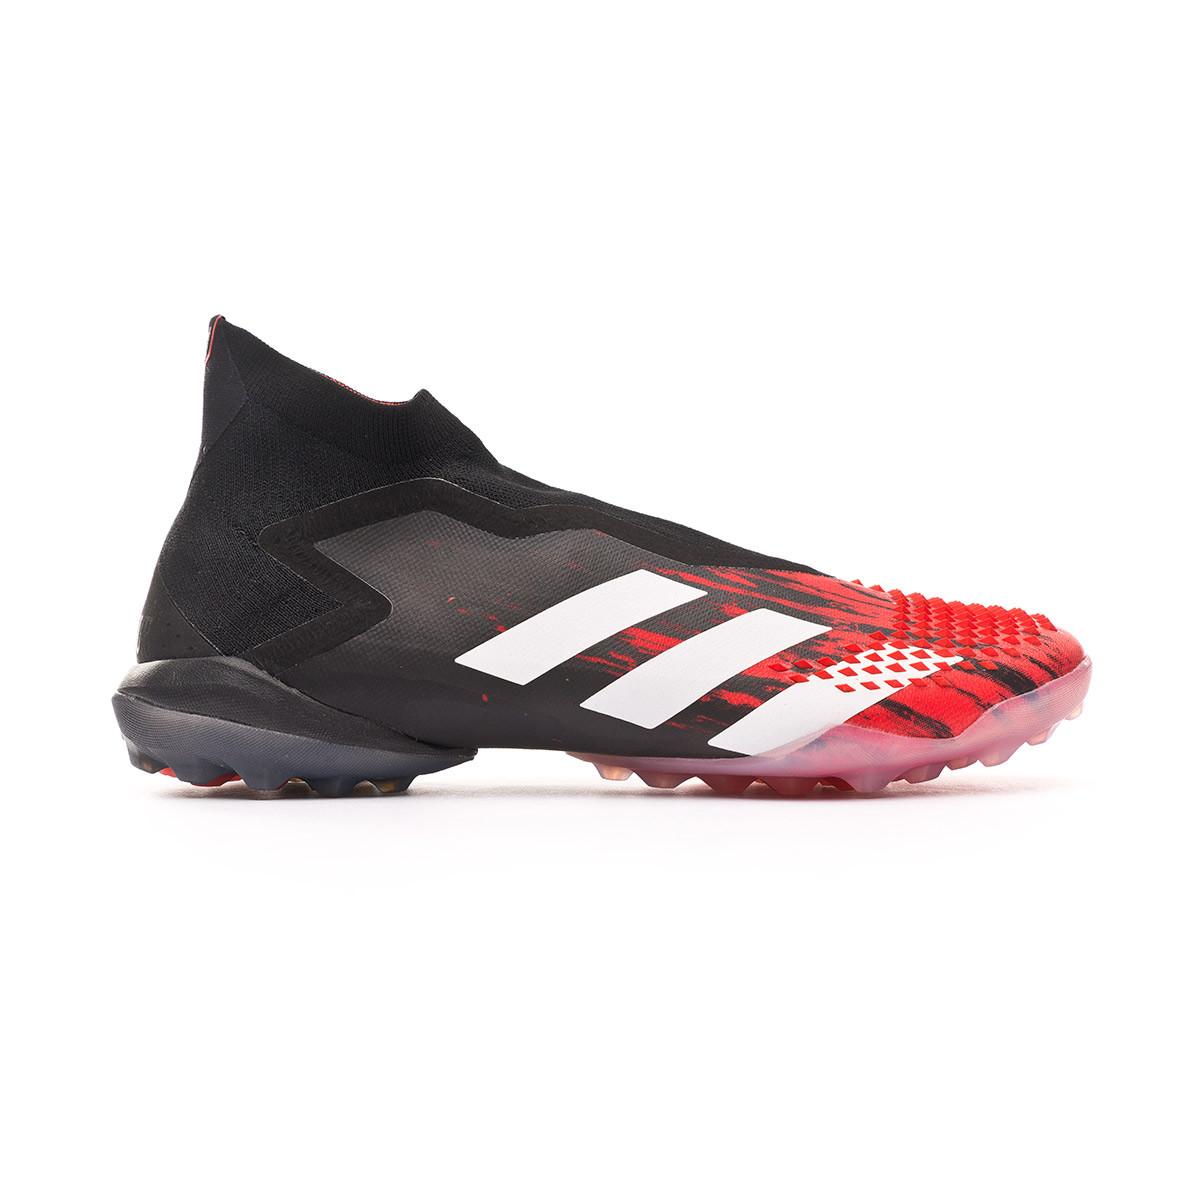 antecedentes Bonito Empuje hacia abajo  Football Boot adidas Predator 20+ Turf Core black-White-Active red -  Football store Fútbol Emotion